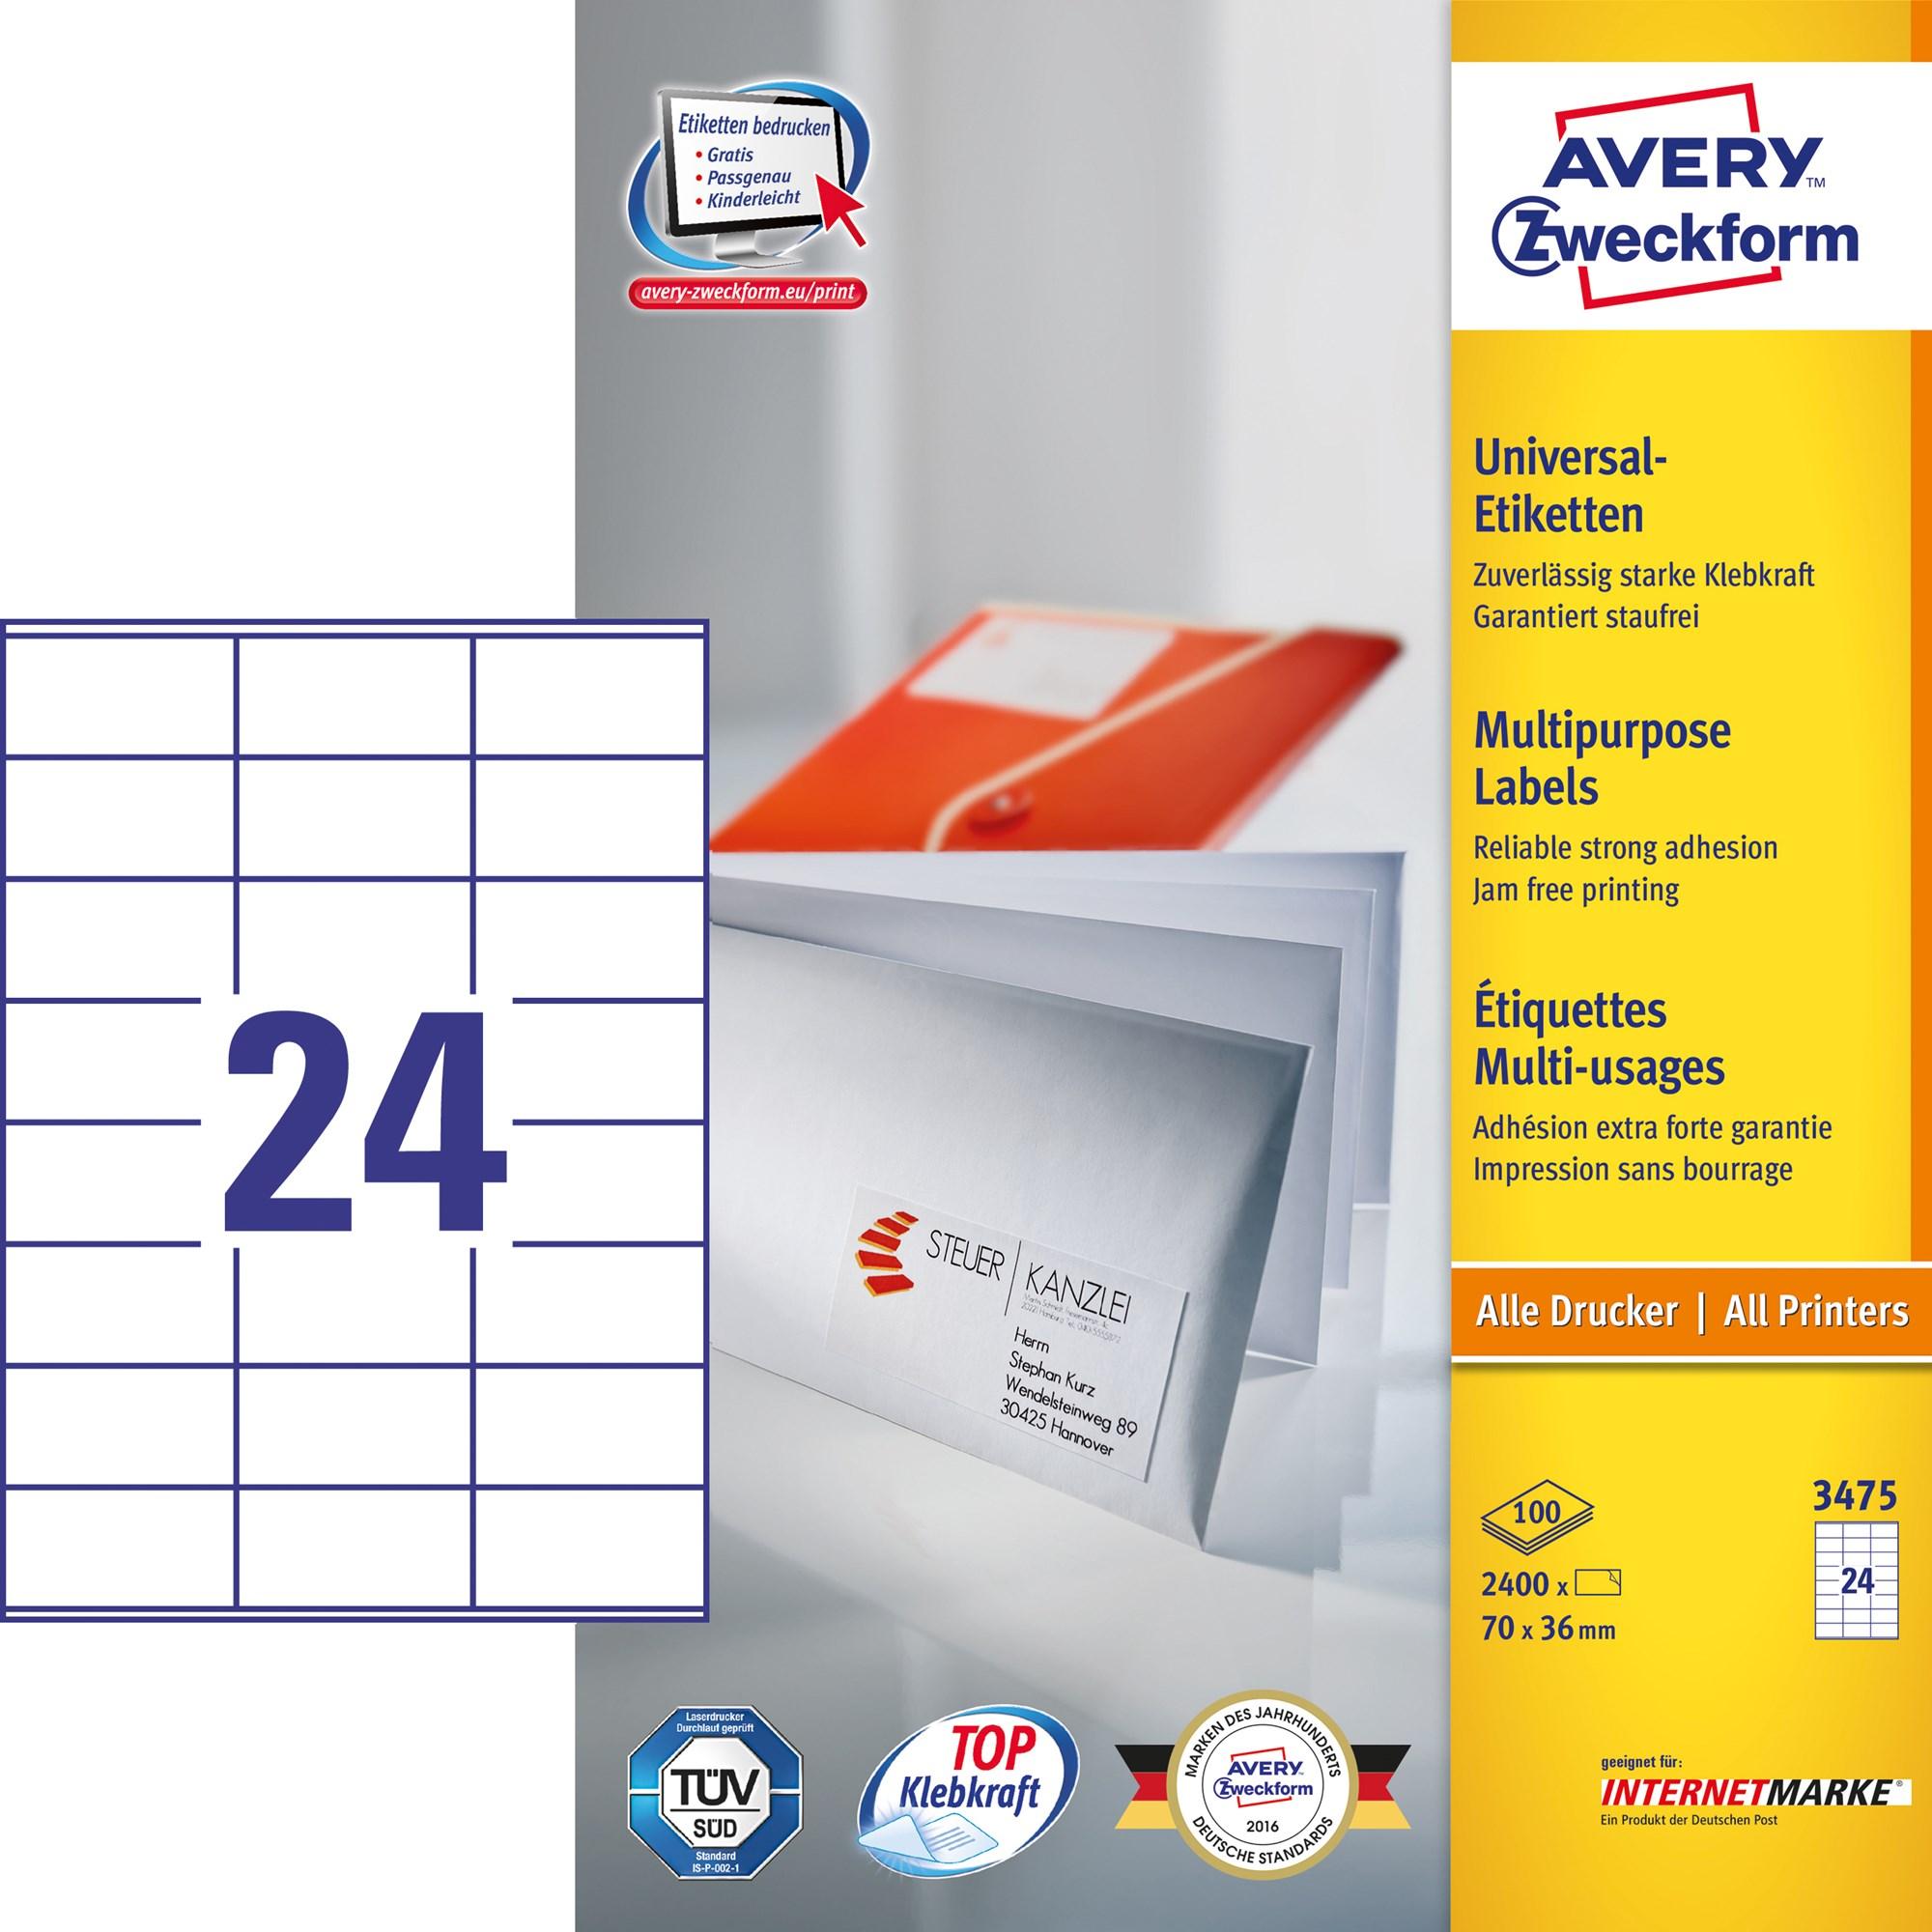 Image of Avery ILC universal etiket 70x36mm (2400)